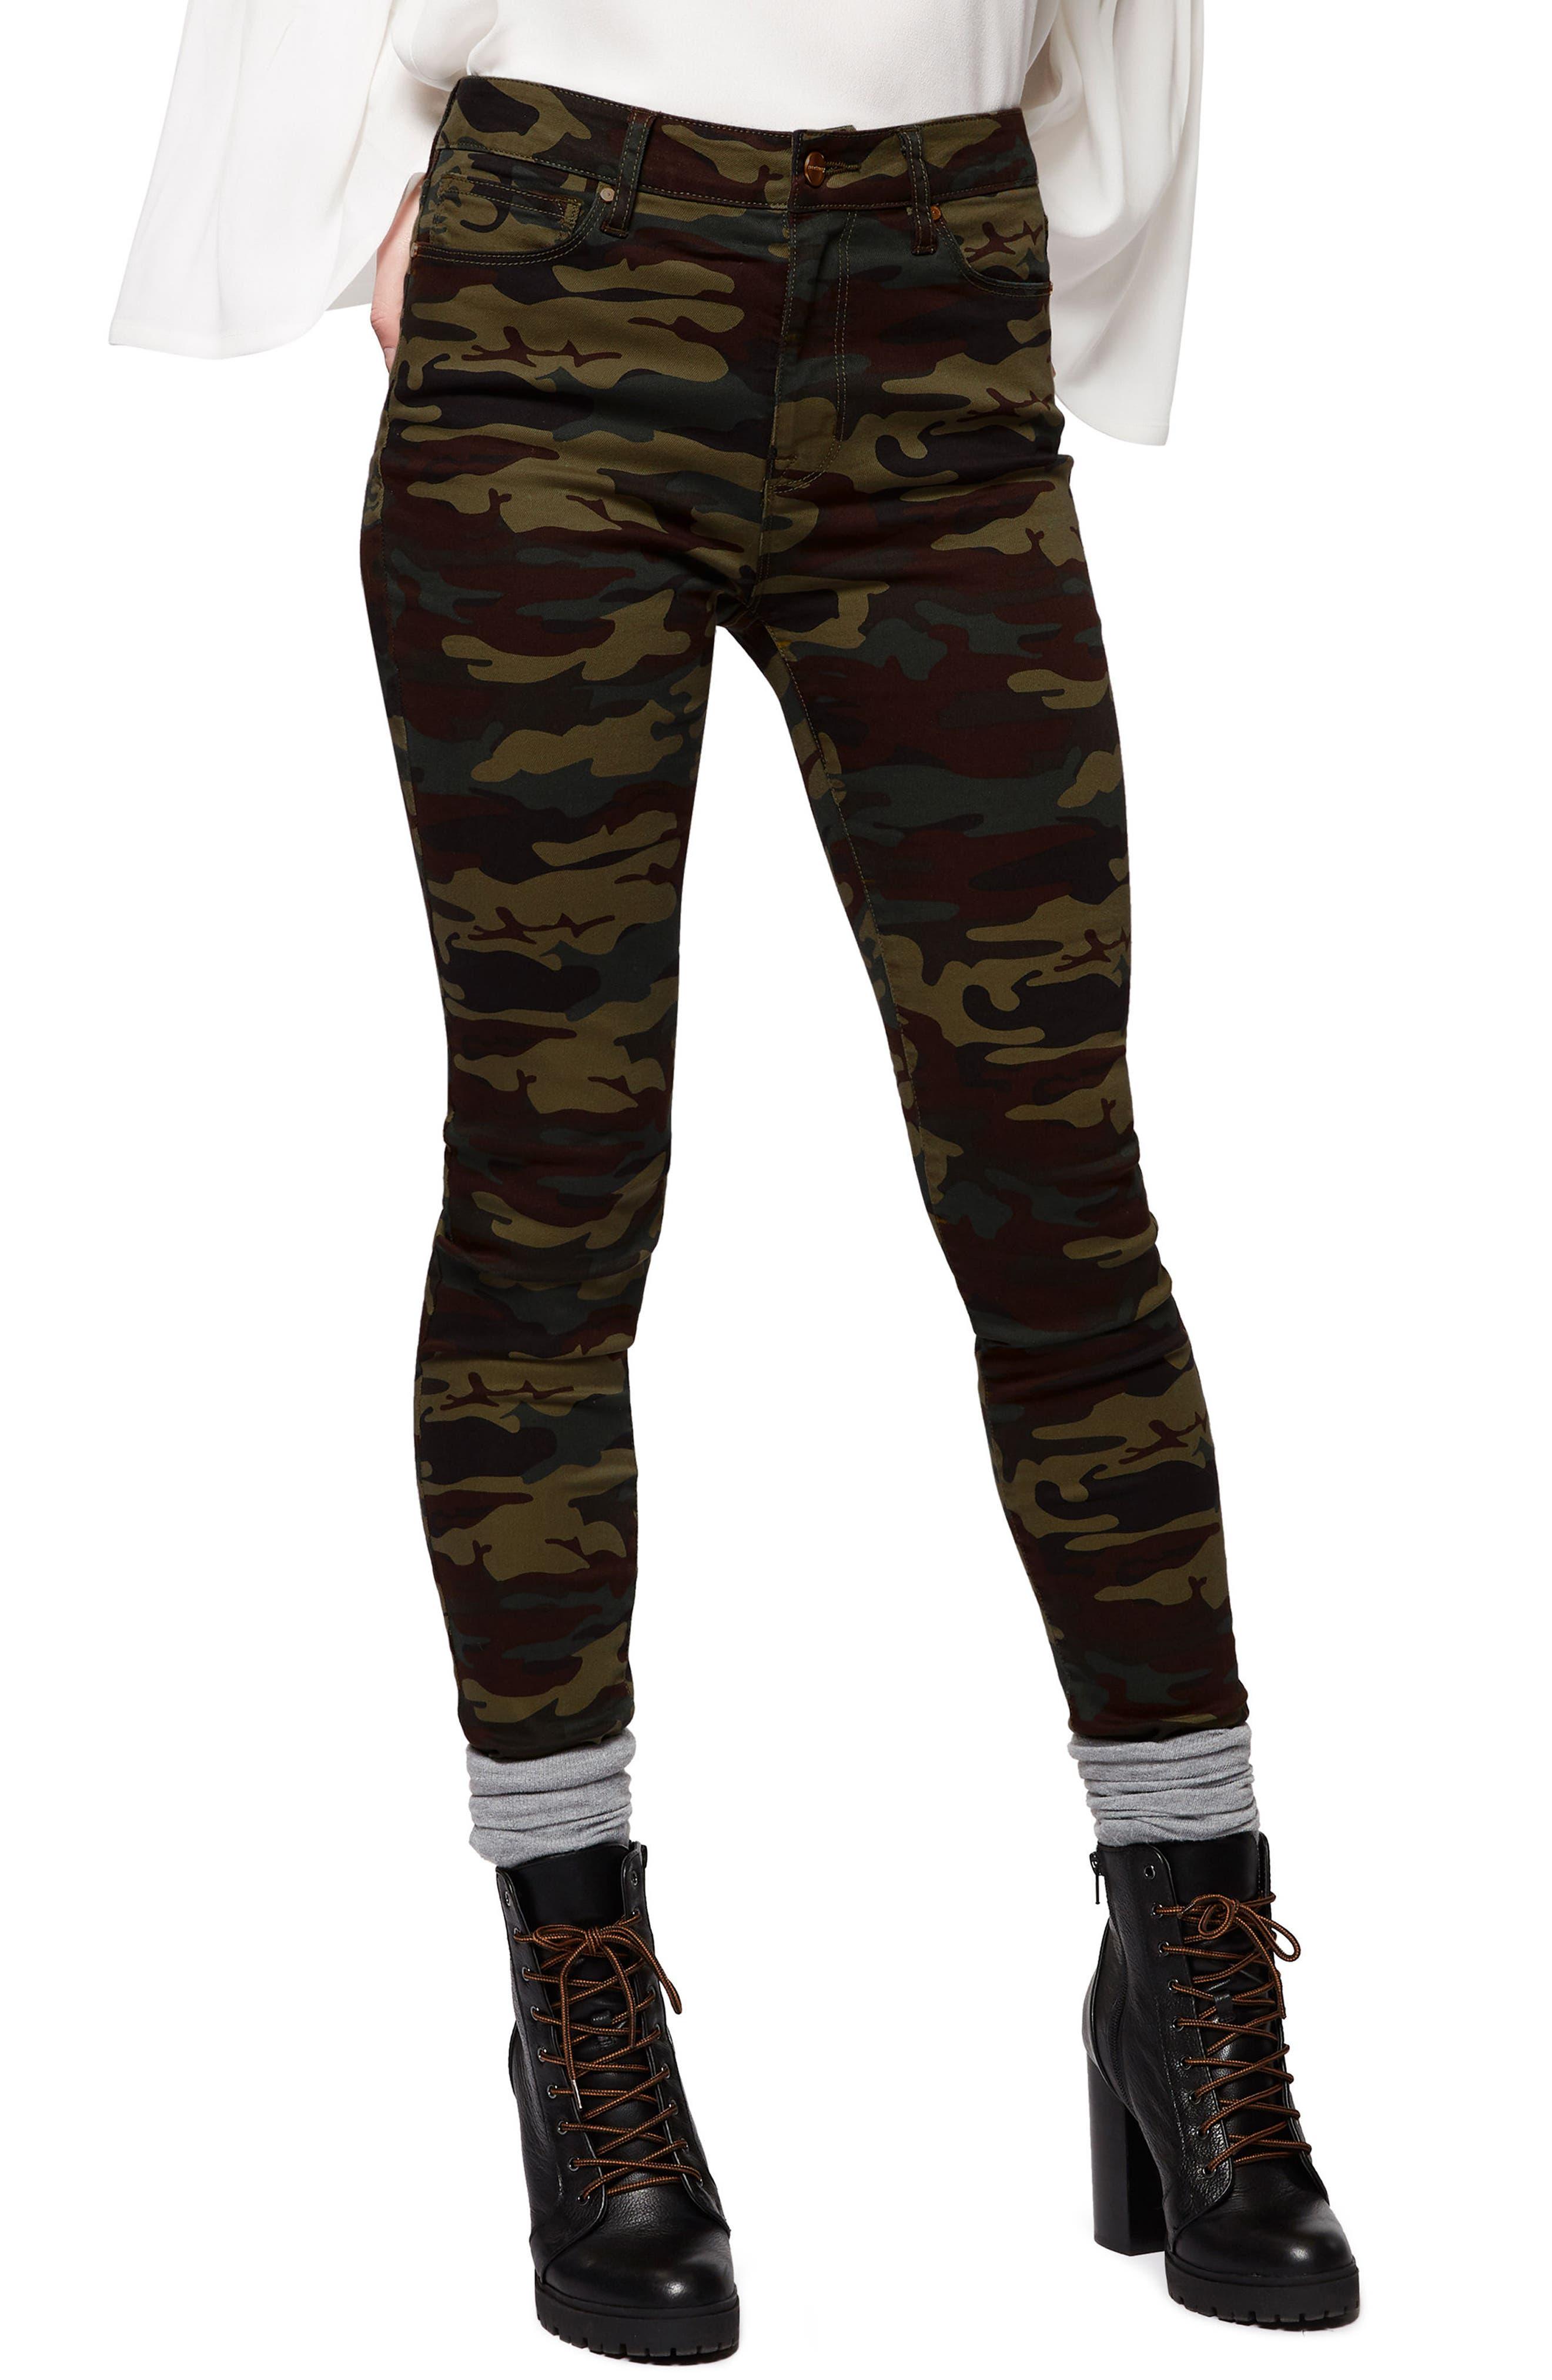 Robbie Camo Print Skinny Pants,                         Main,                         color, Camp Camo